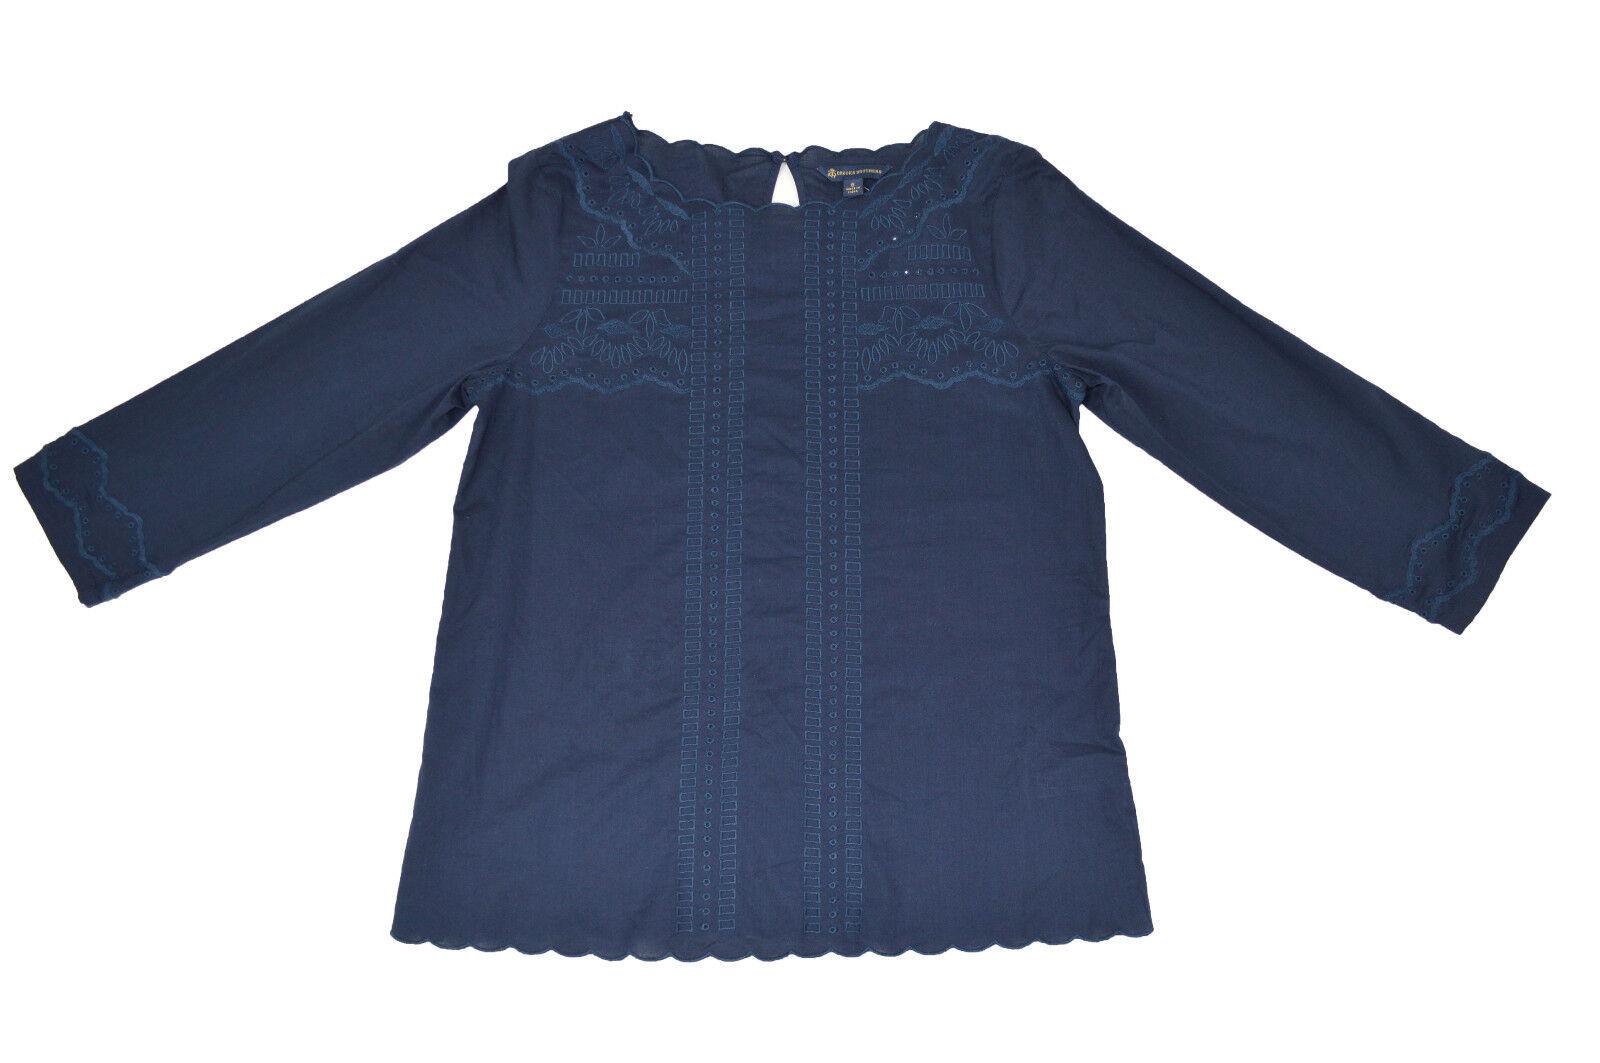 Brooks Brothers damen Navy Blau Long-Sleeve T-Shirt Blouse